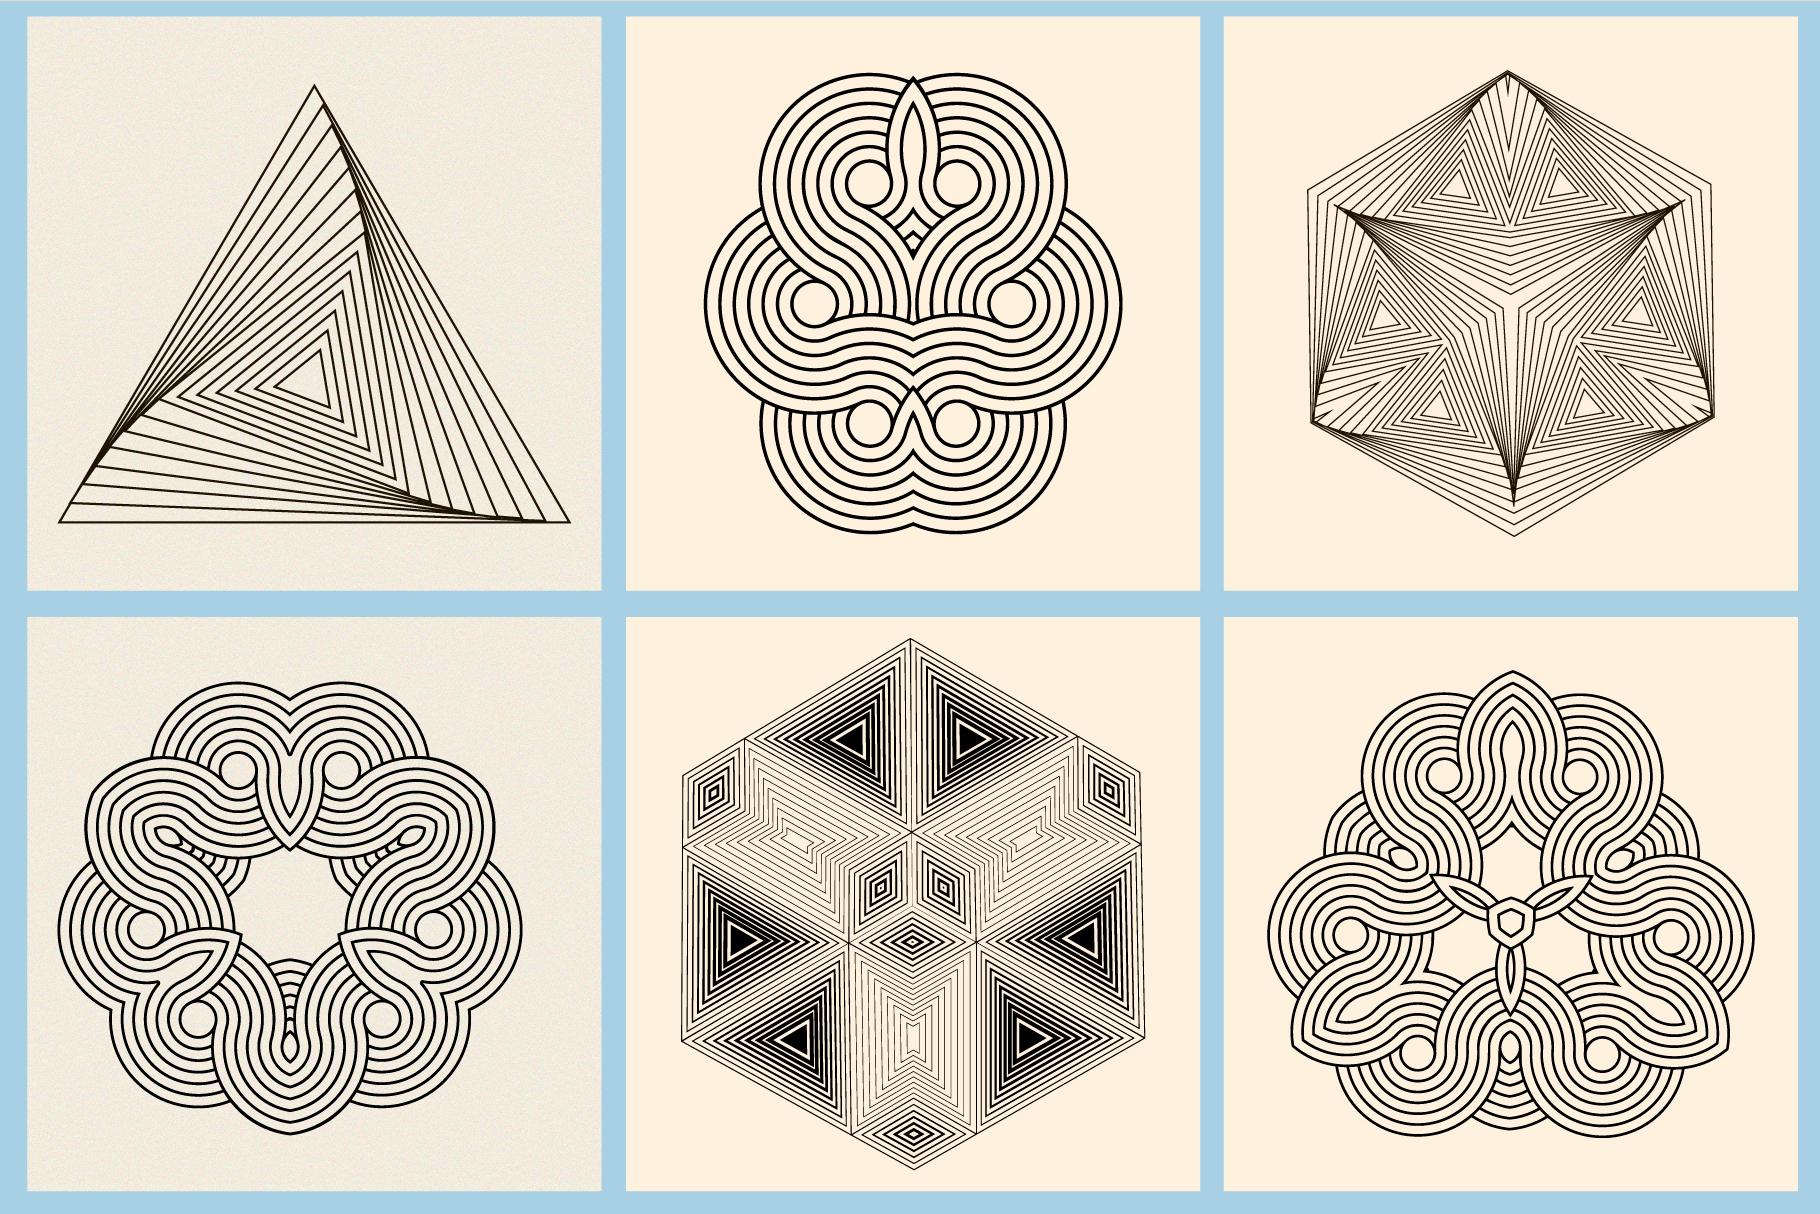 Illusion linear geometric shapes example image 12